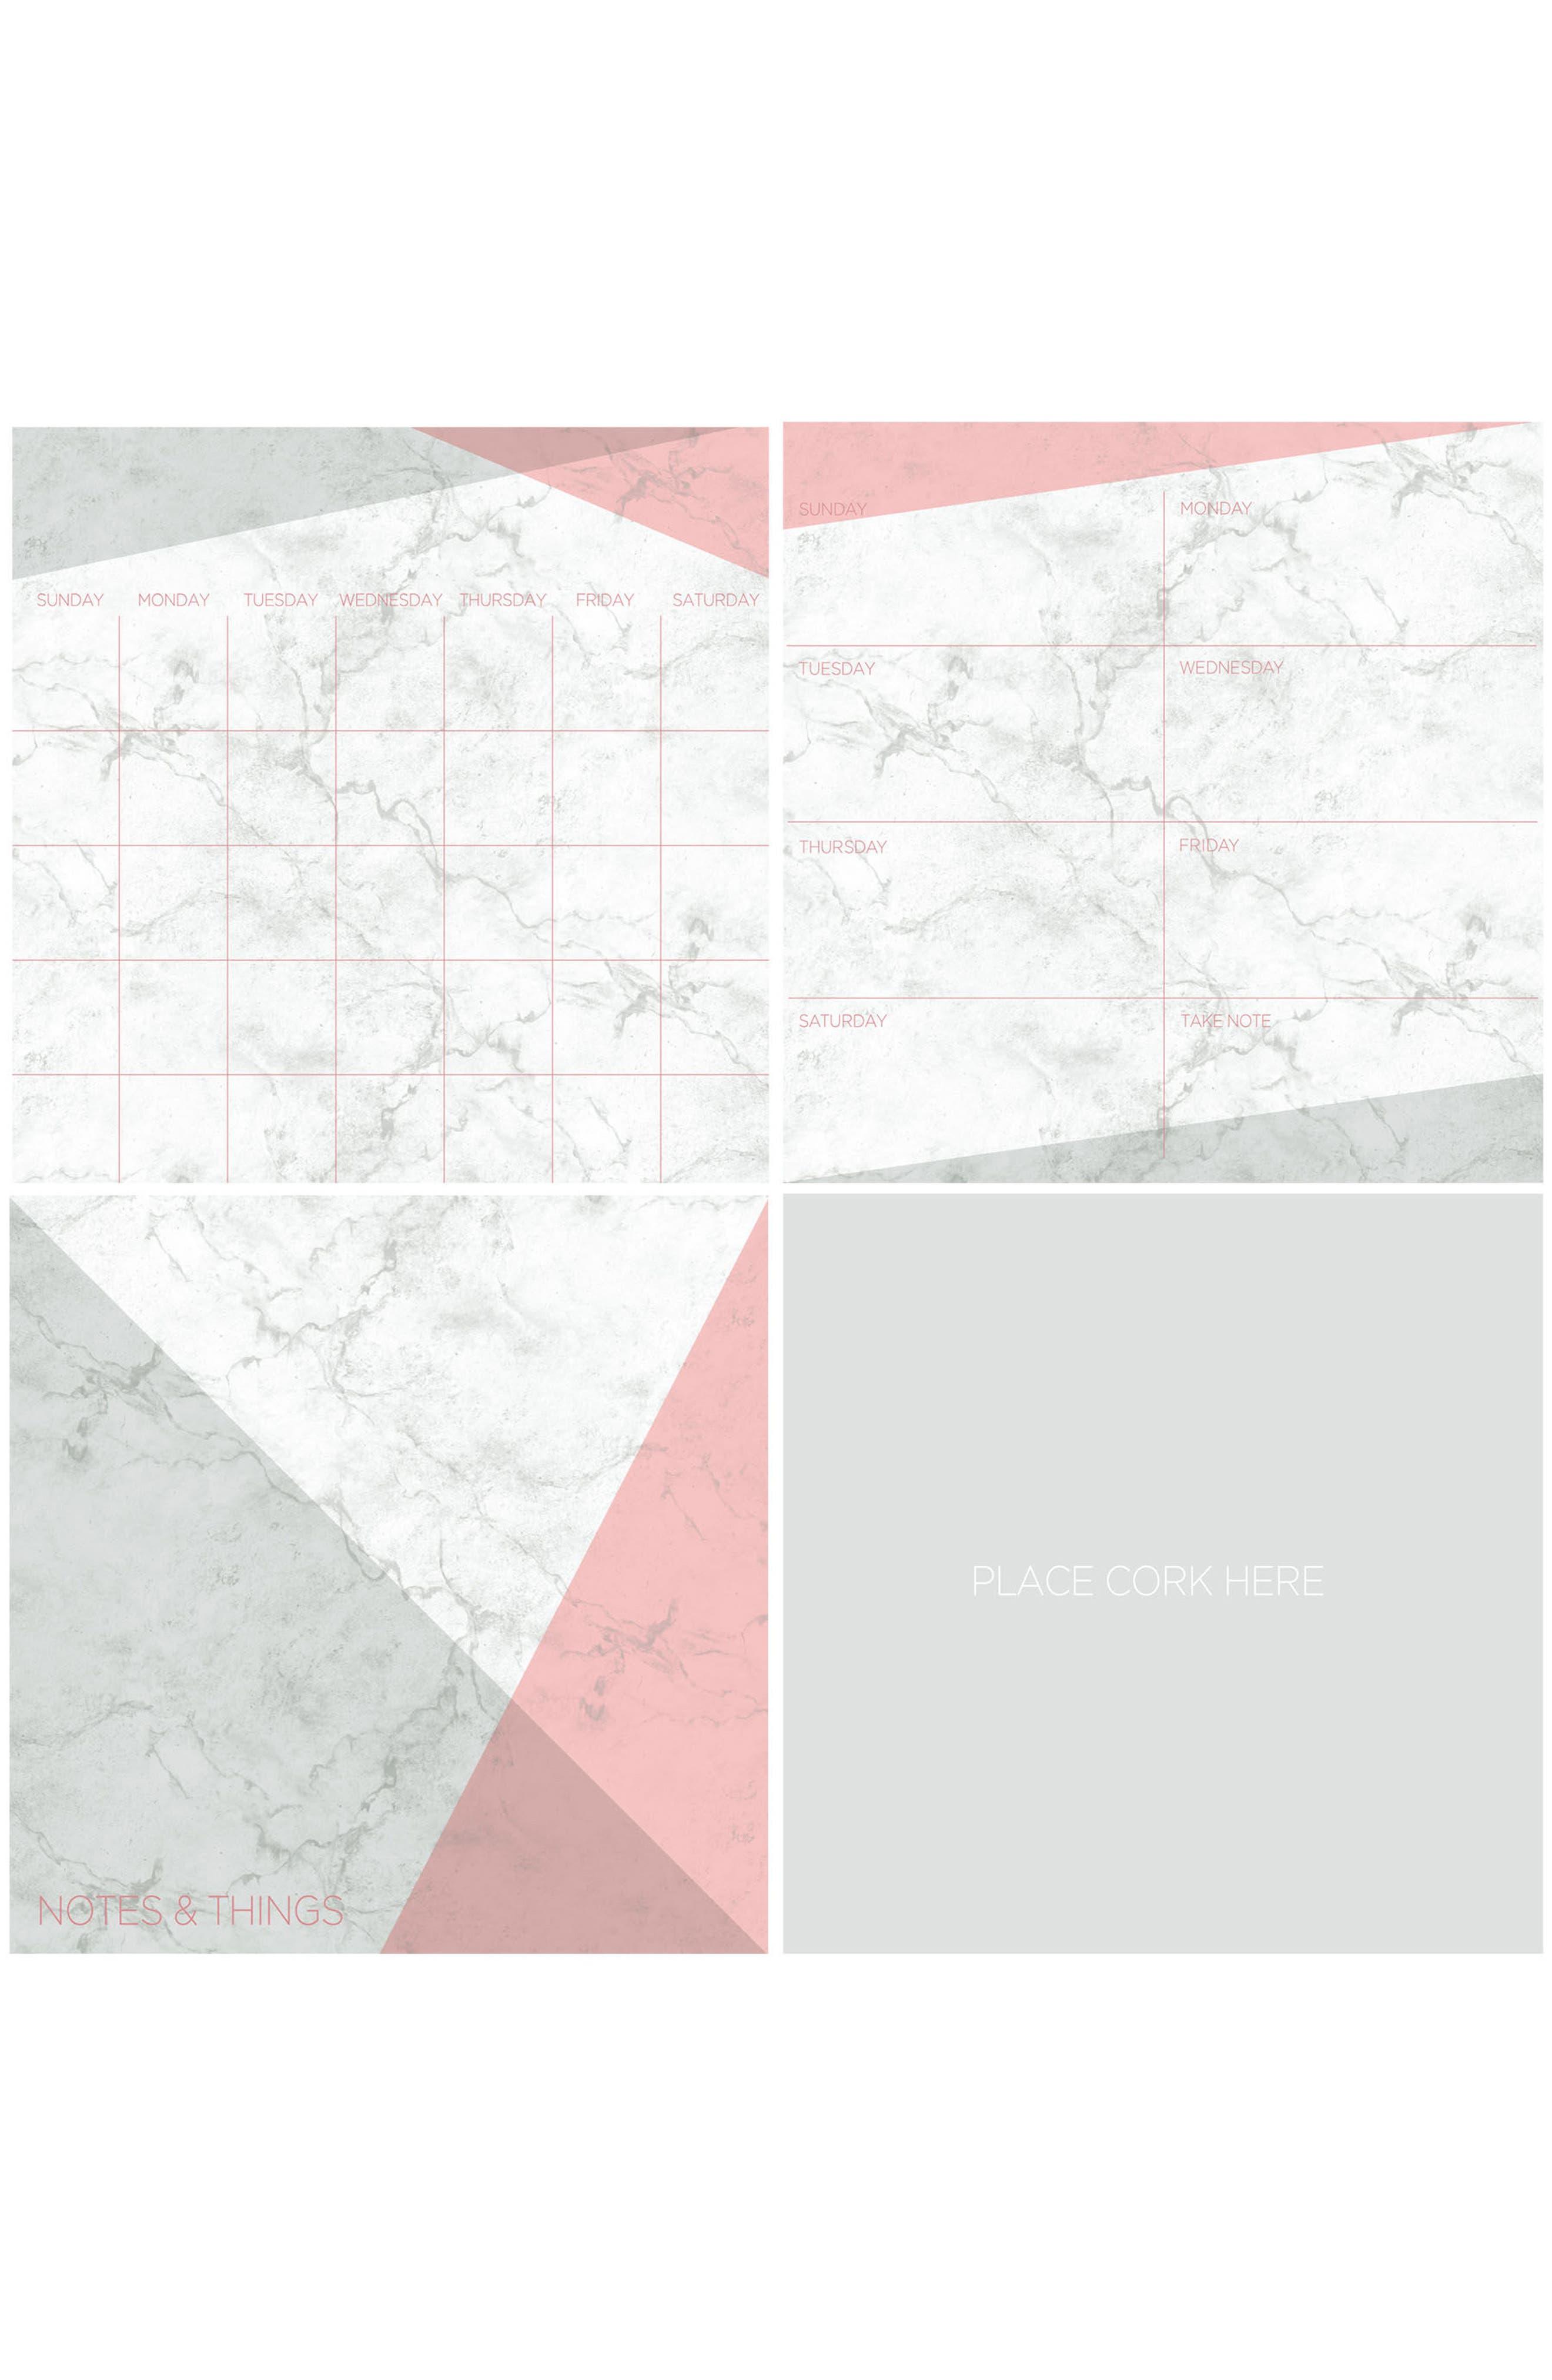 Everest Wall Decal Organization Kit,                             Main thumbnail 1, color,                             100